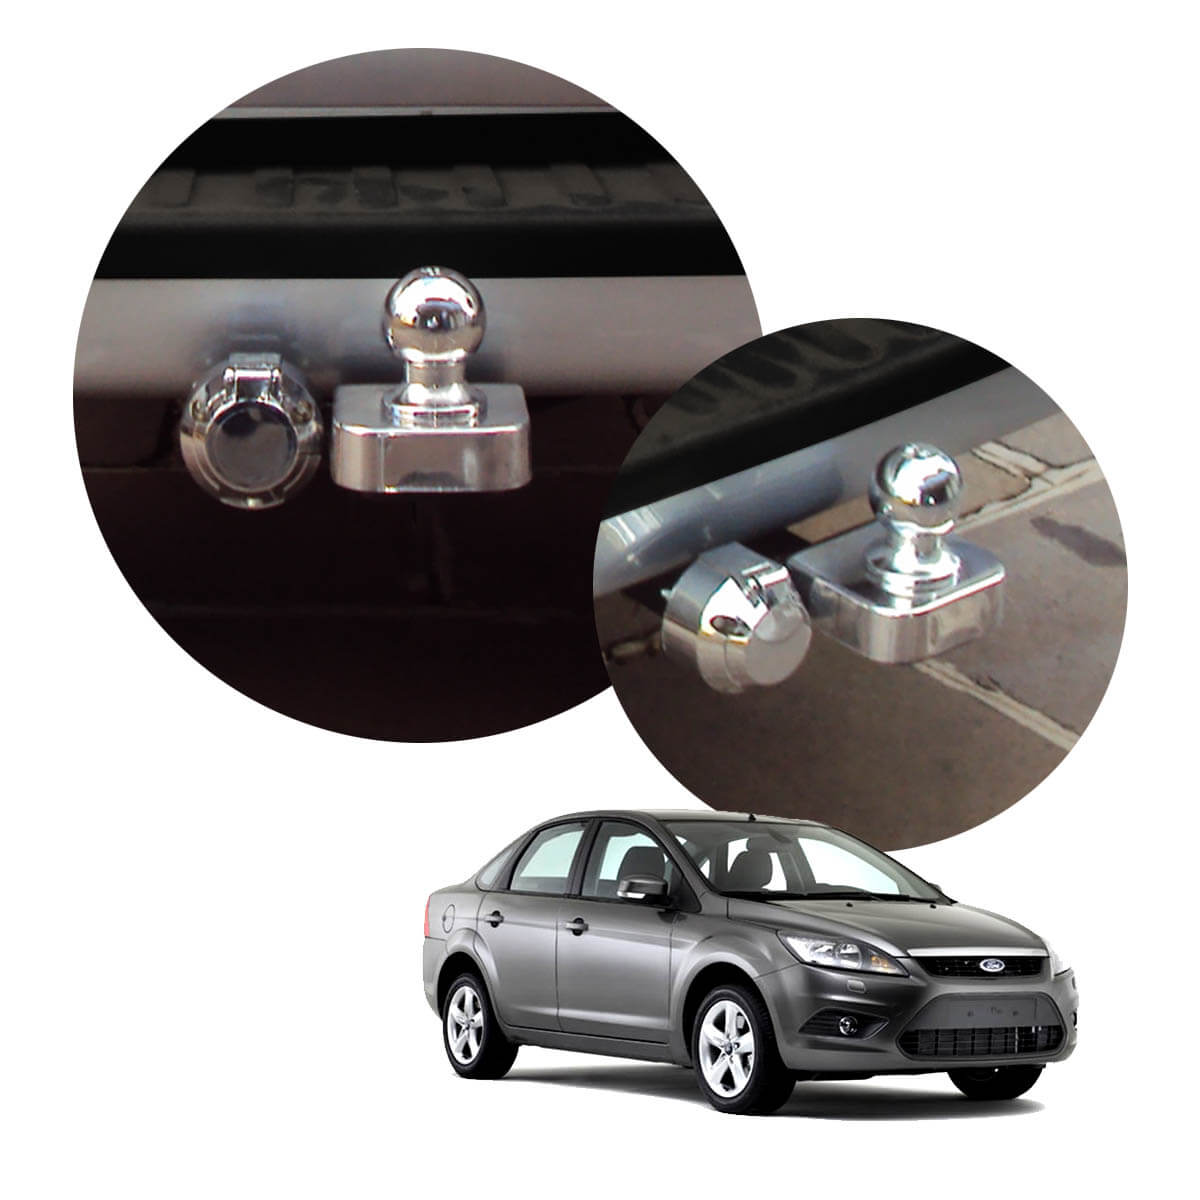 Engate de reboque fixo Focus sedan 2009 a 2013